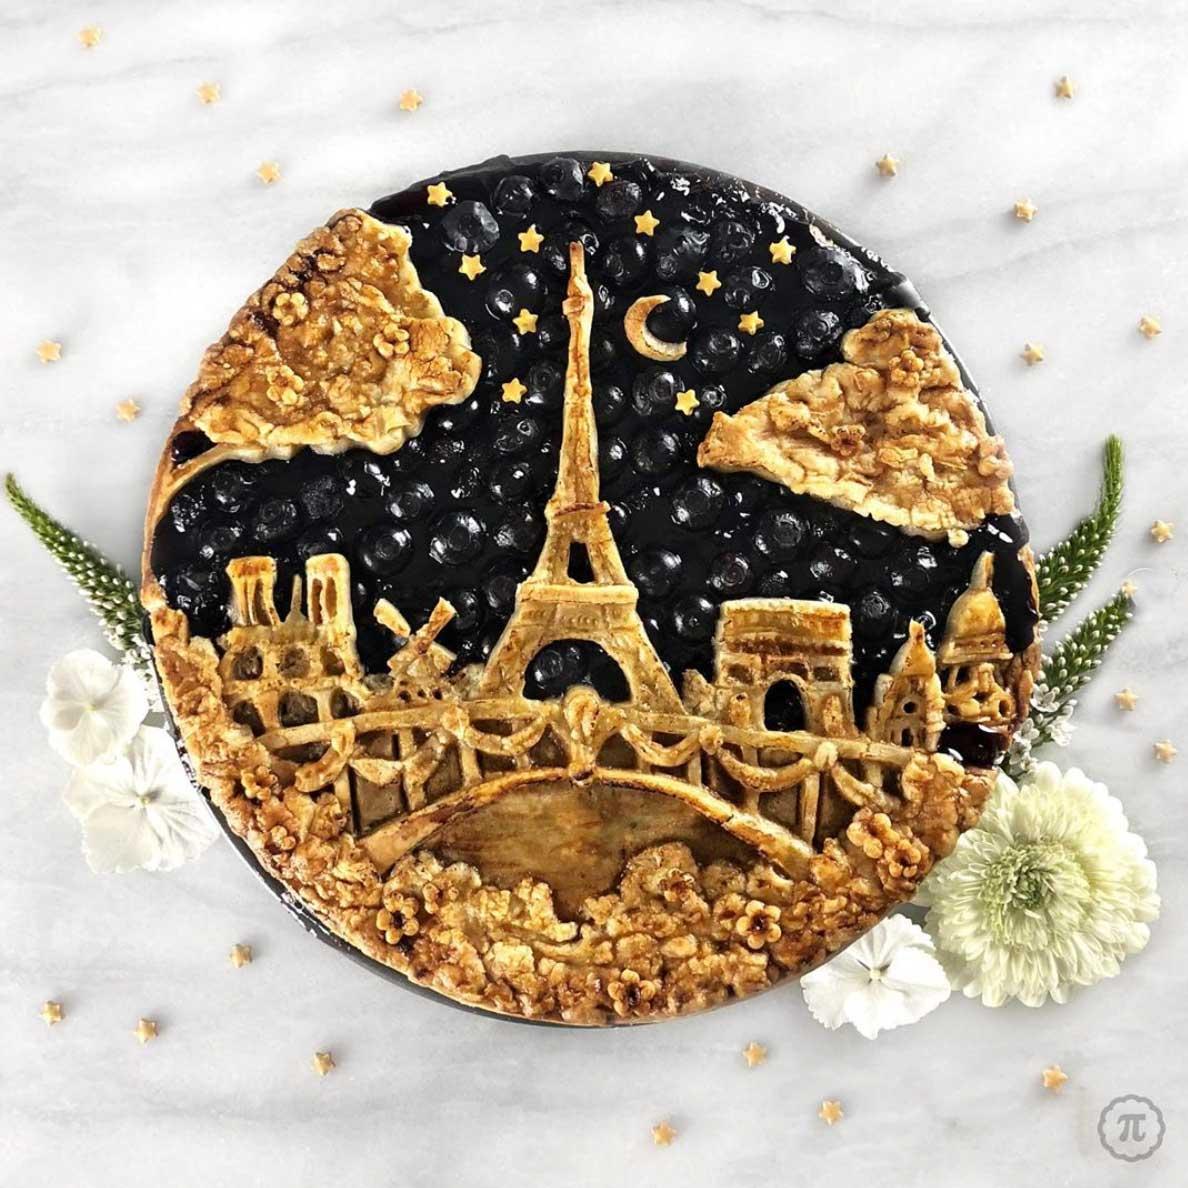 Kreative Kuchenkunst von Jessica Clark-Bojin piesareawesome-Jessica-Clark-Bojin_13